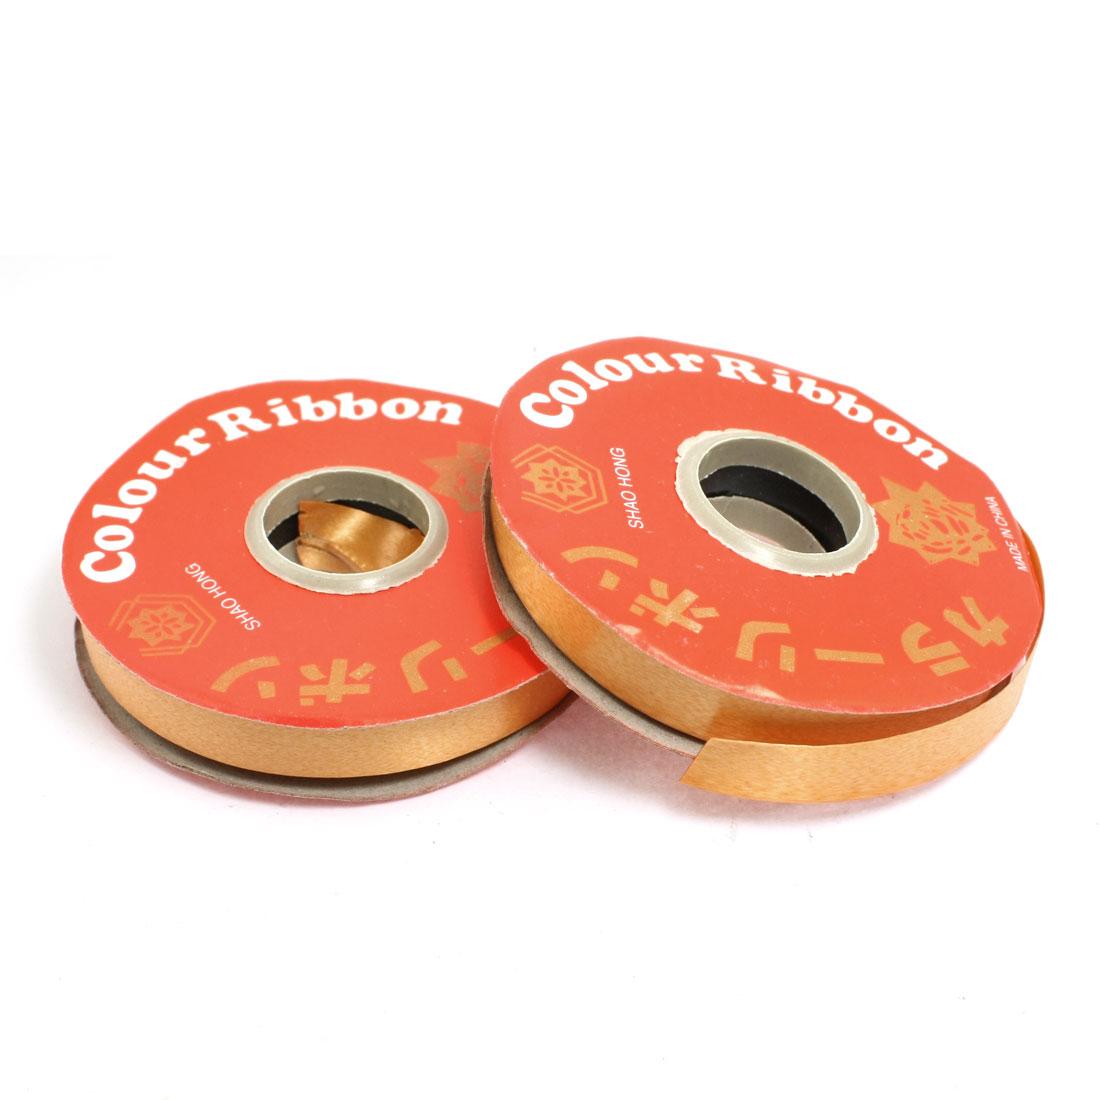 Gift Wrapping DIY Orange Ribbon Roll Tape 1.3cm Width 2 Pcs